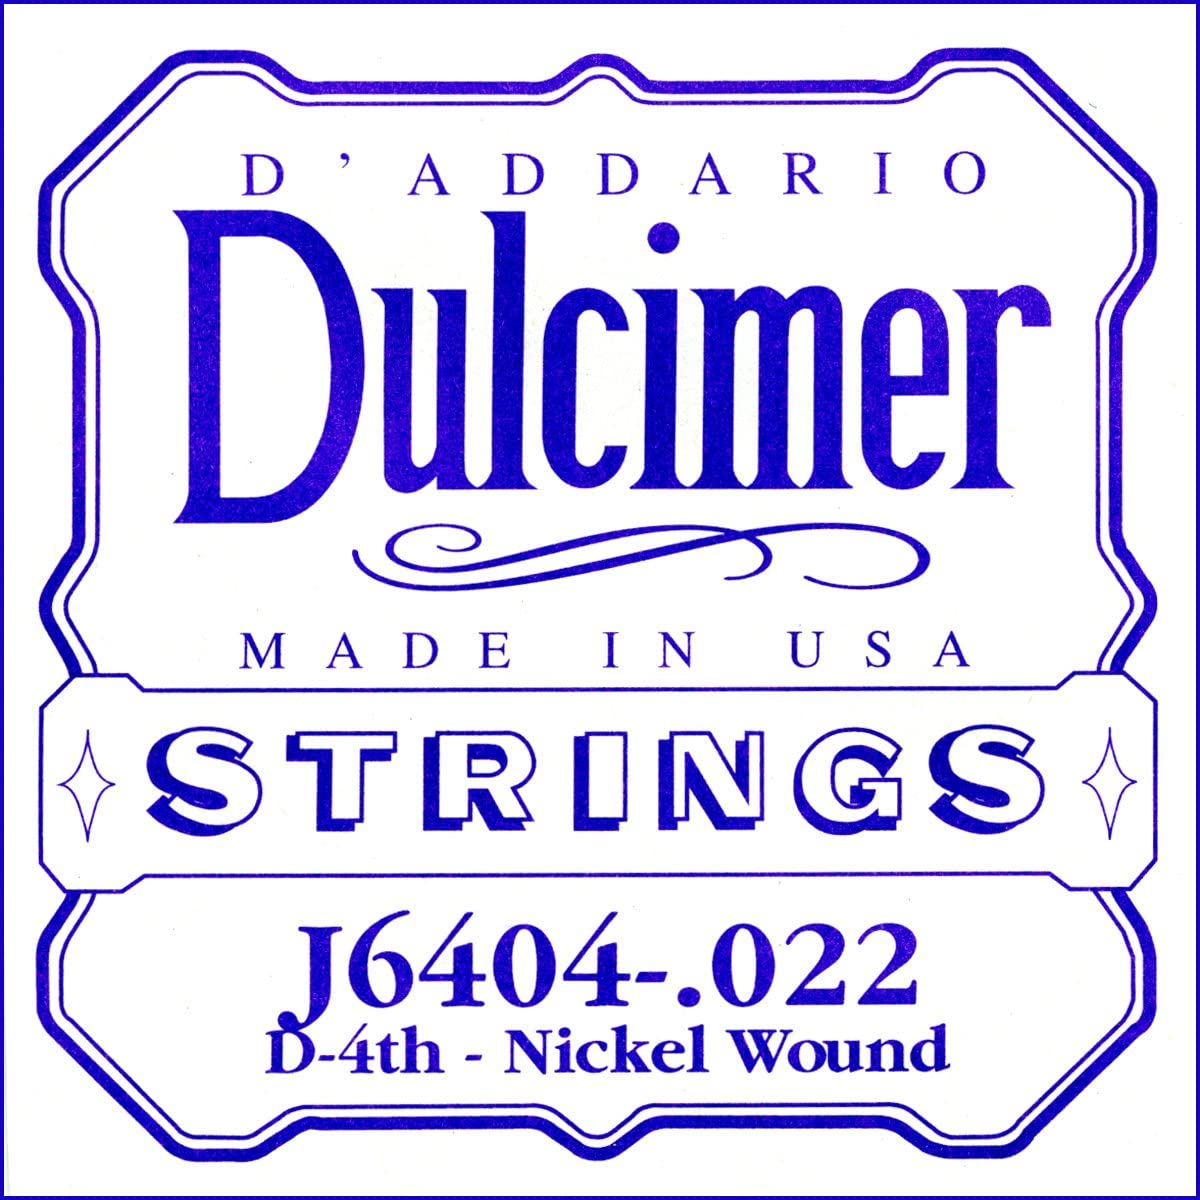 D`ADDARIO J6404 니켈 상처 덜 시머 단일 문자열 .022